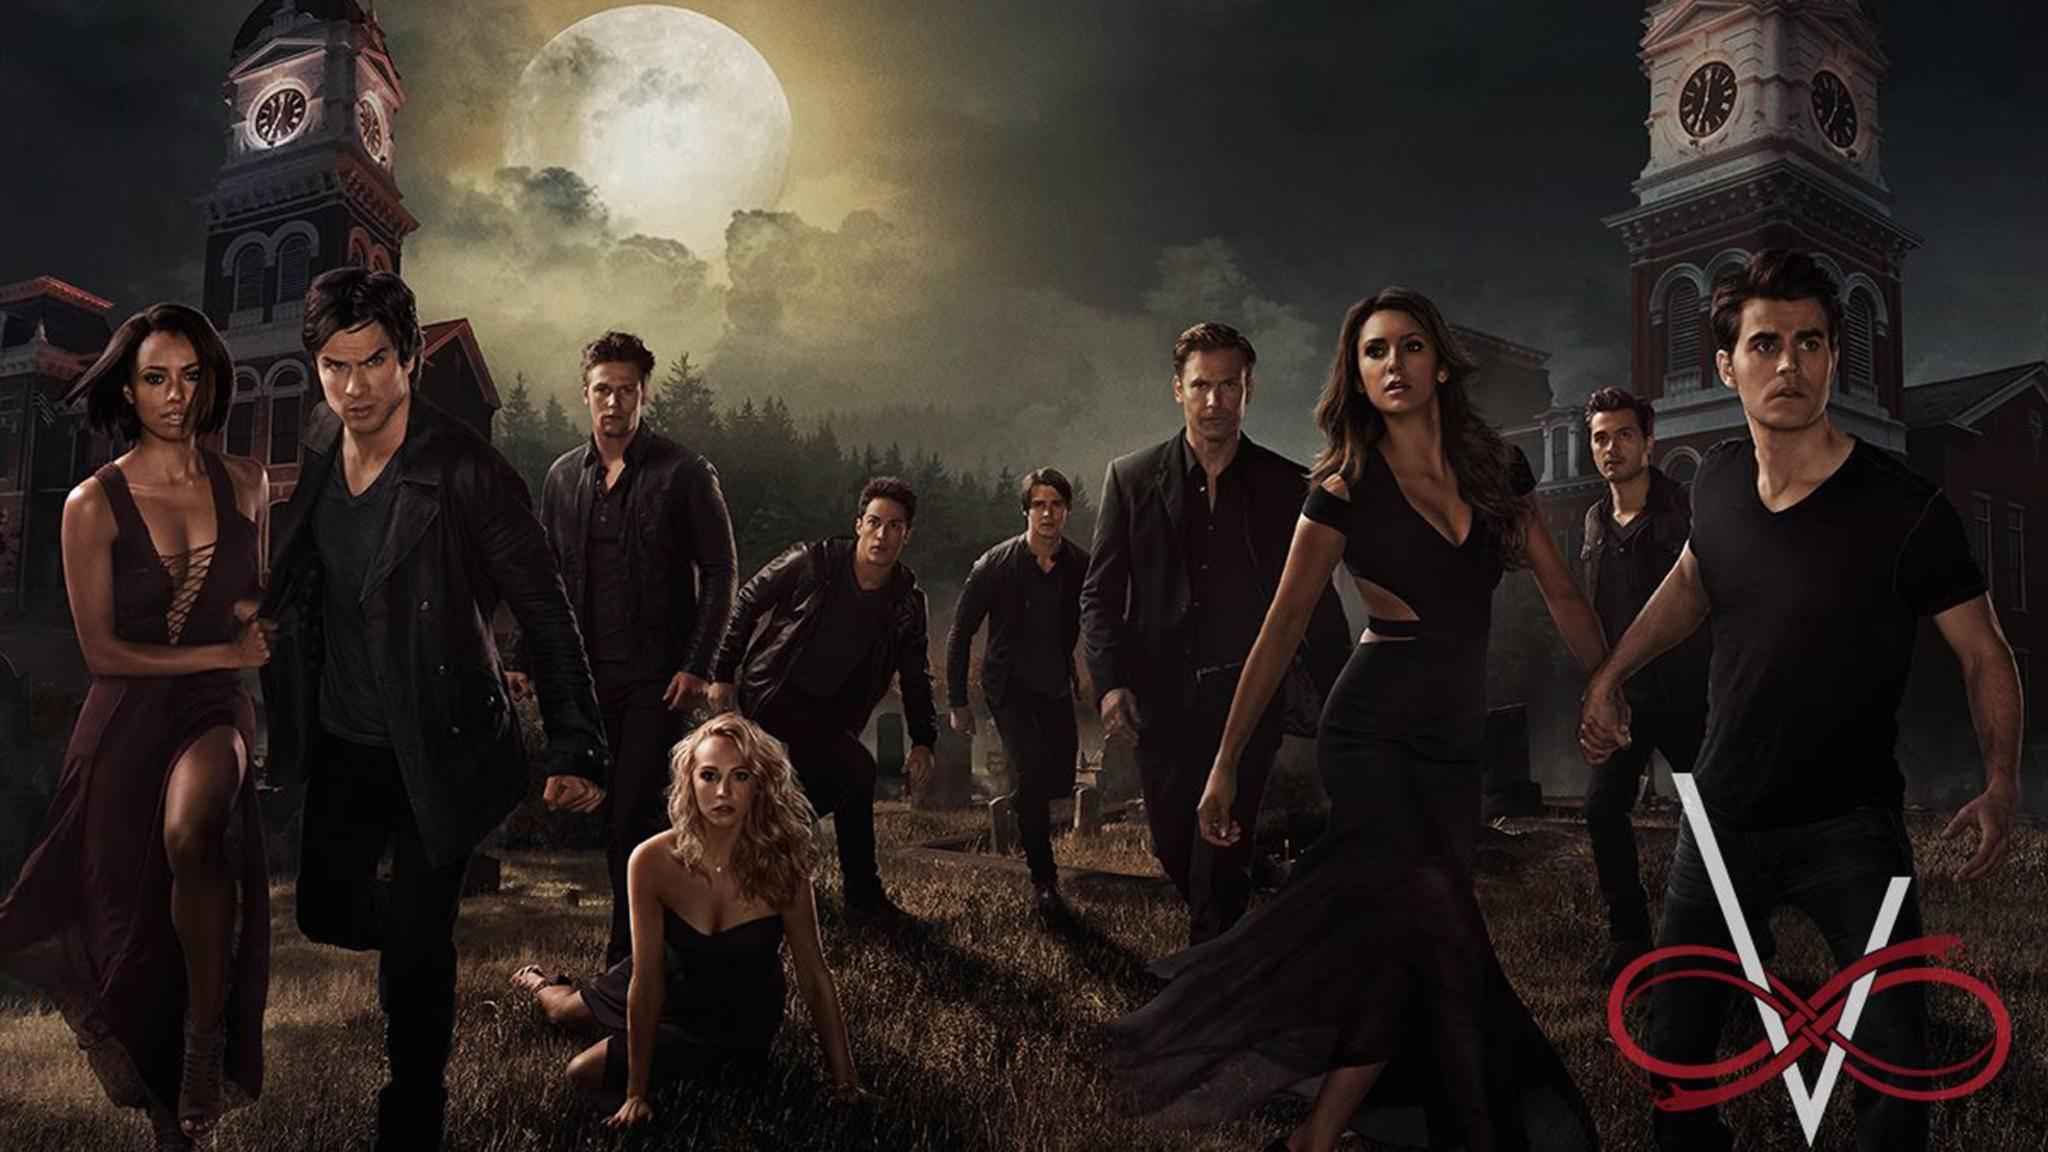 Vampire Diaries Cast Staffel 6